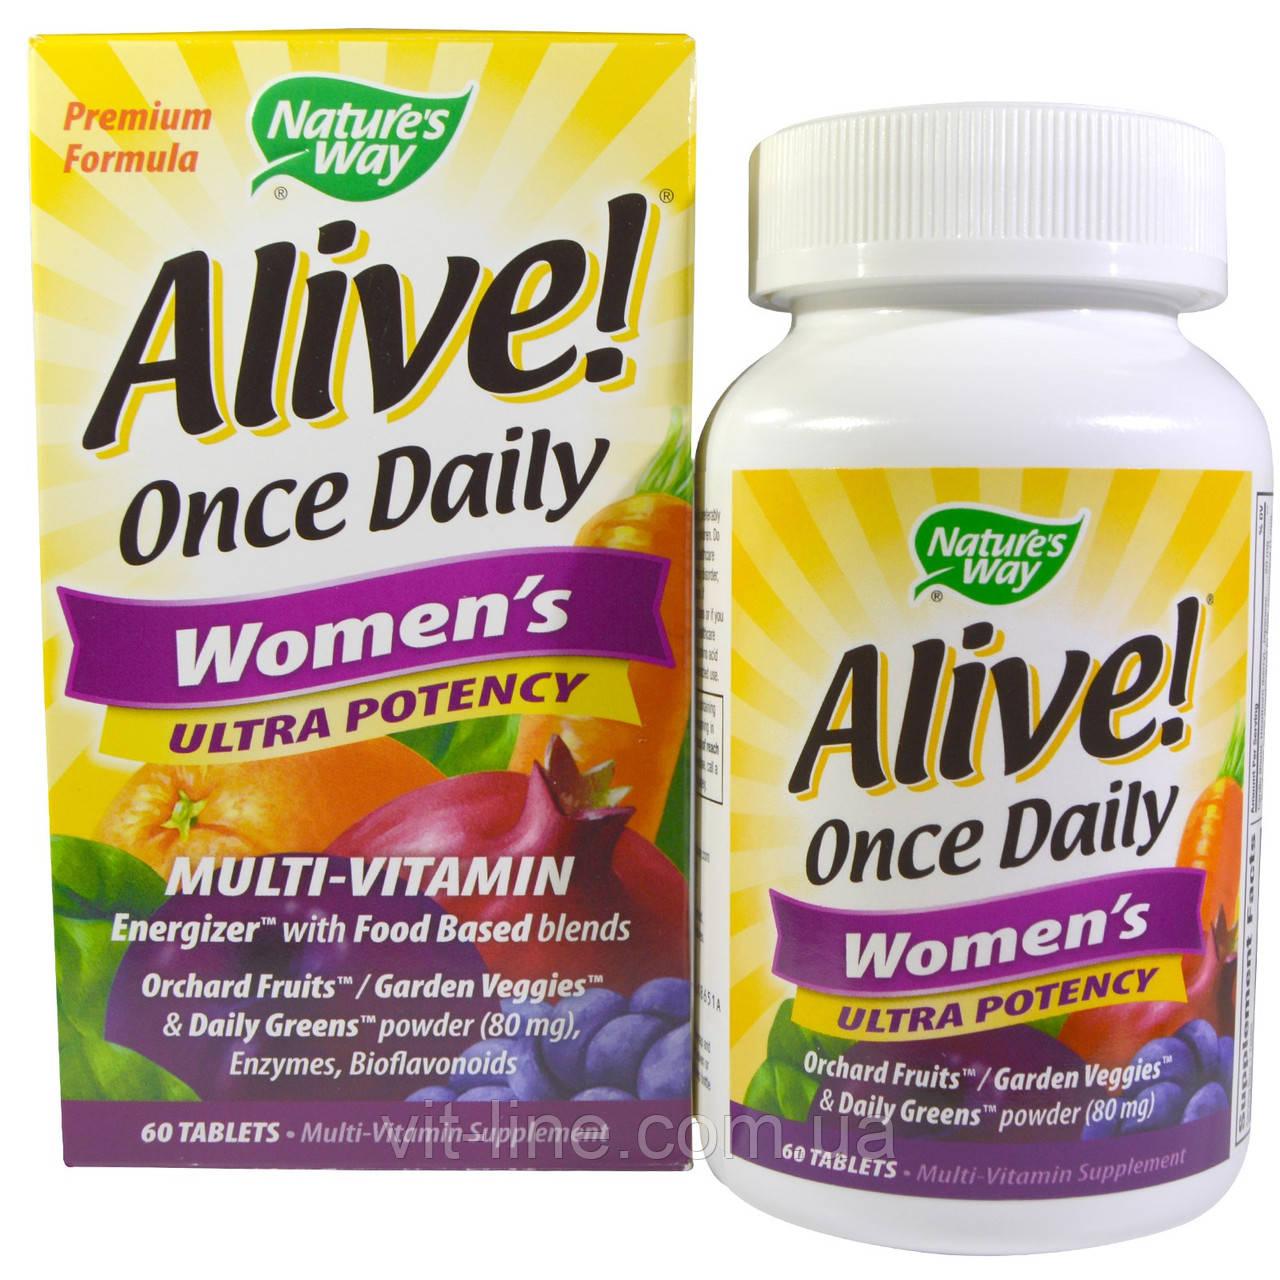 Мультивитамины для женщин 60 таблеток Nature's Way, Alive!